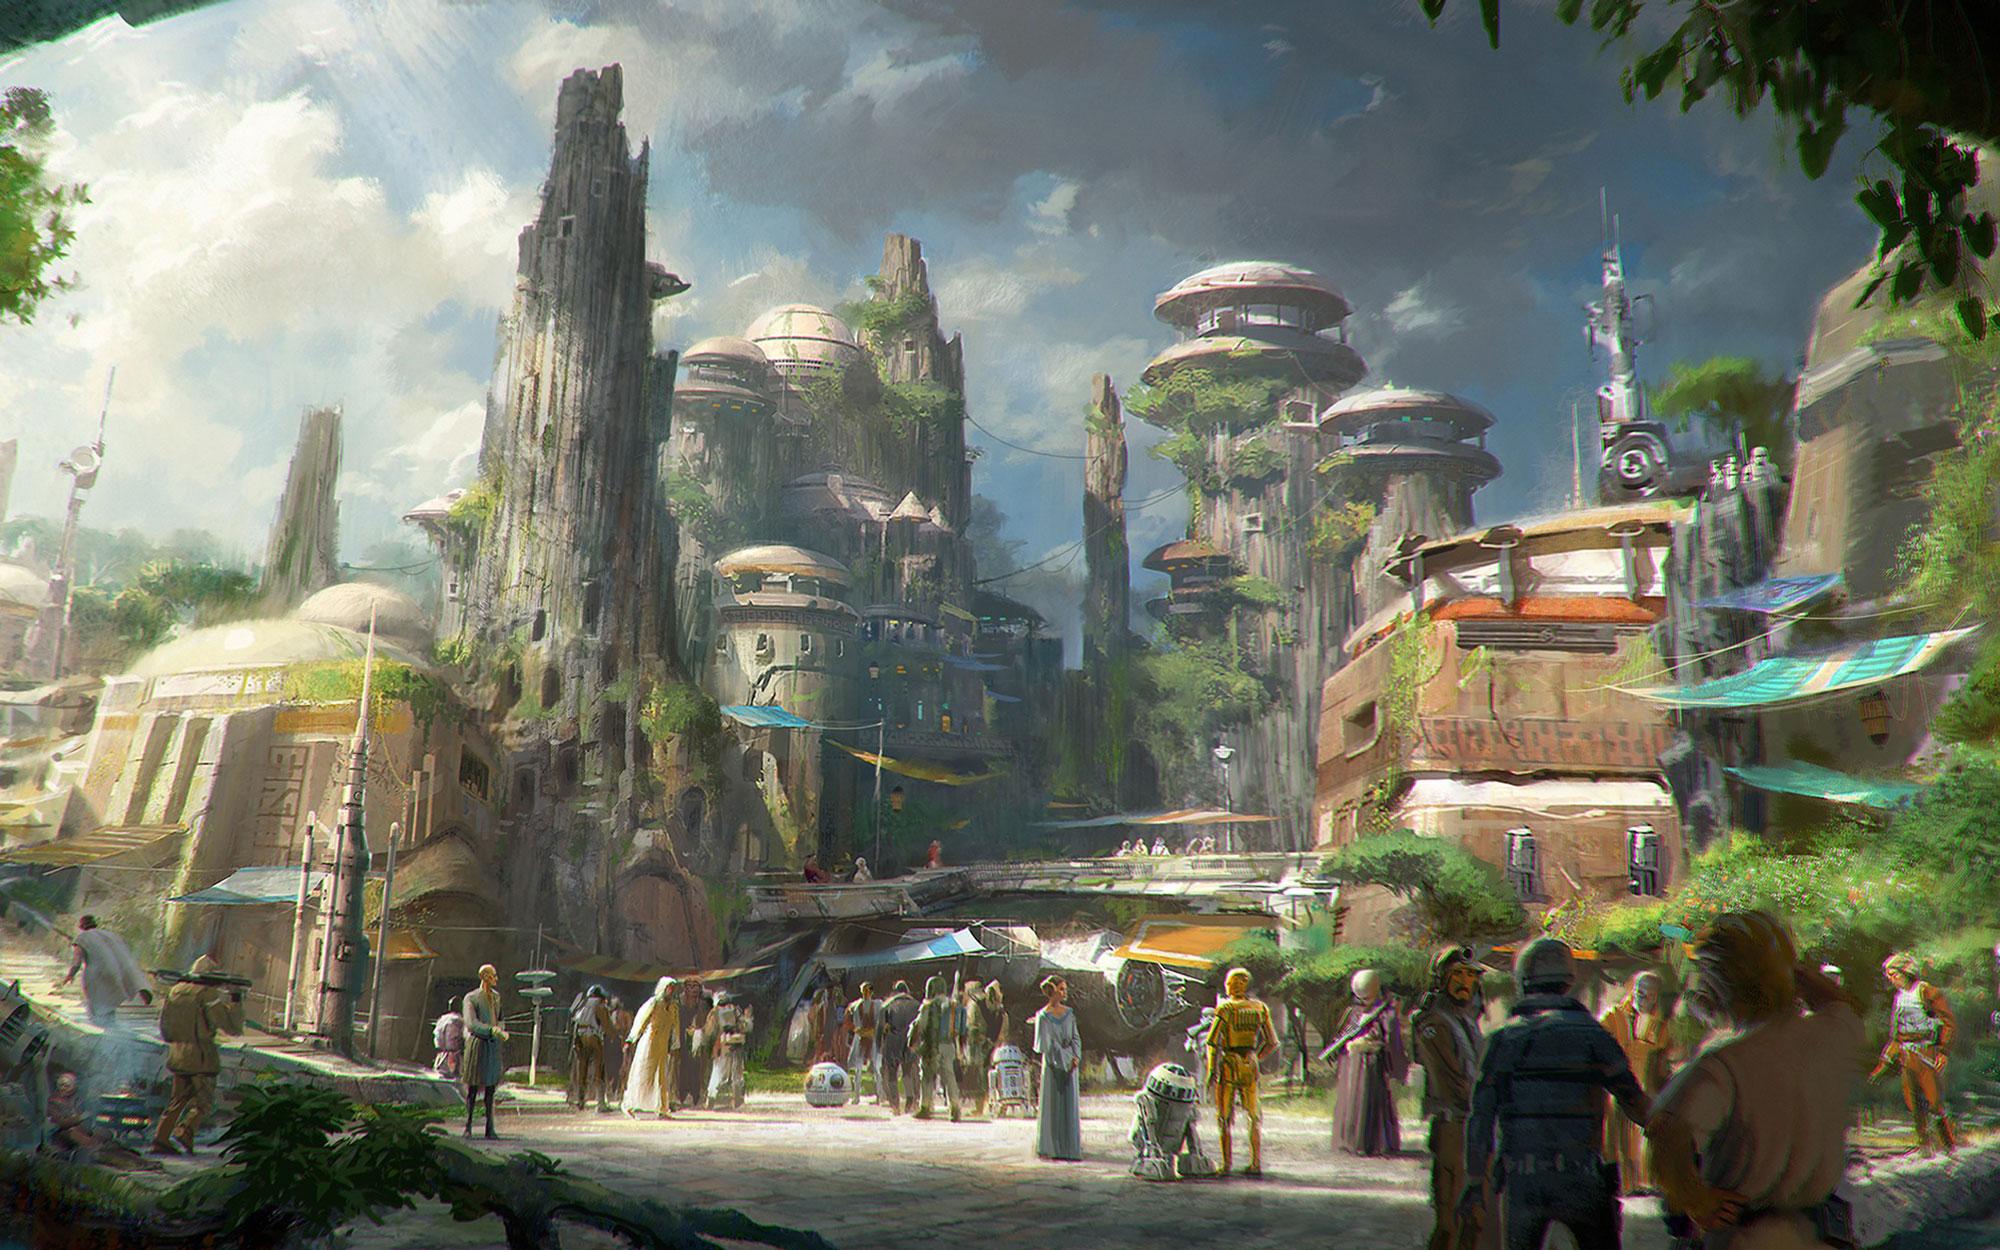 Disney's Star Wars: Galaxy's Edge theme park lands